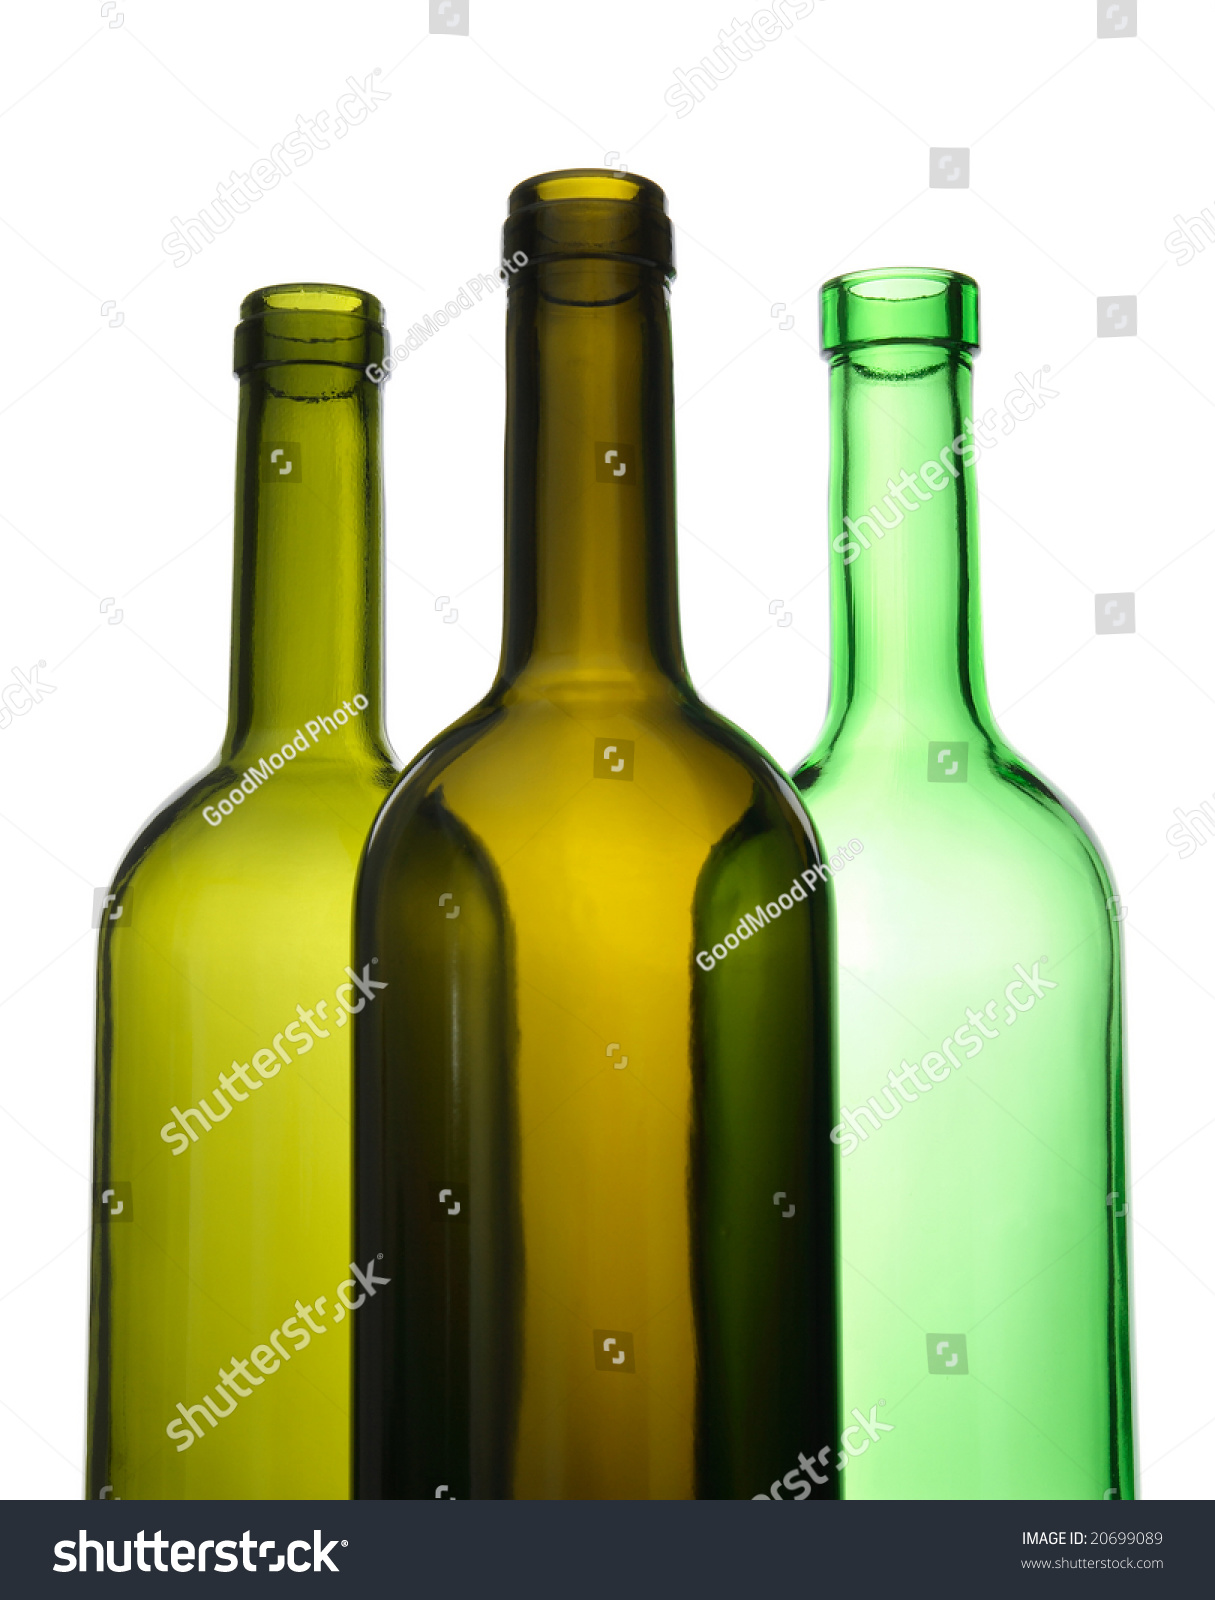 Three empty green wine bottles on white background stock for Green wine bottles